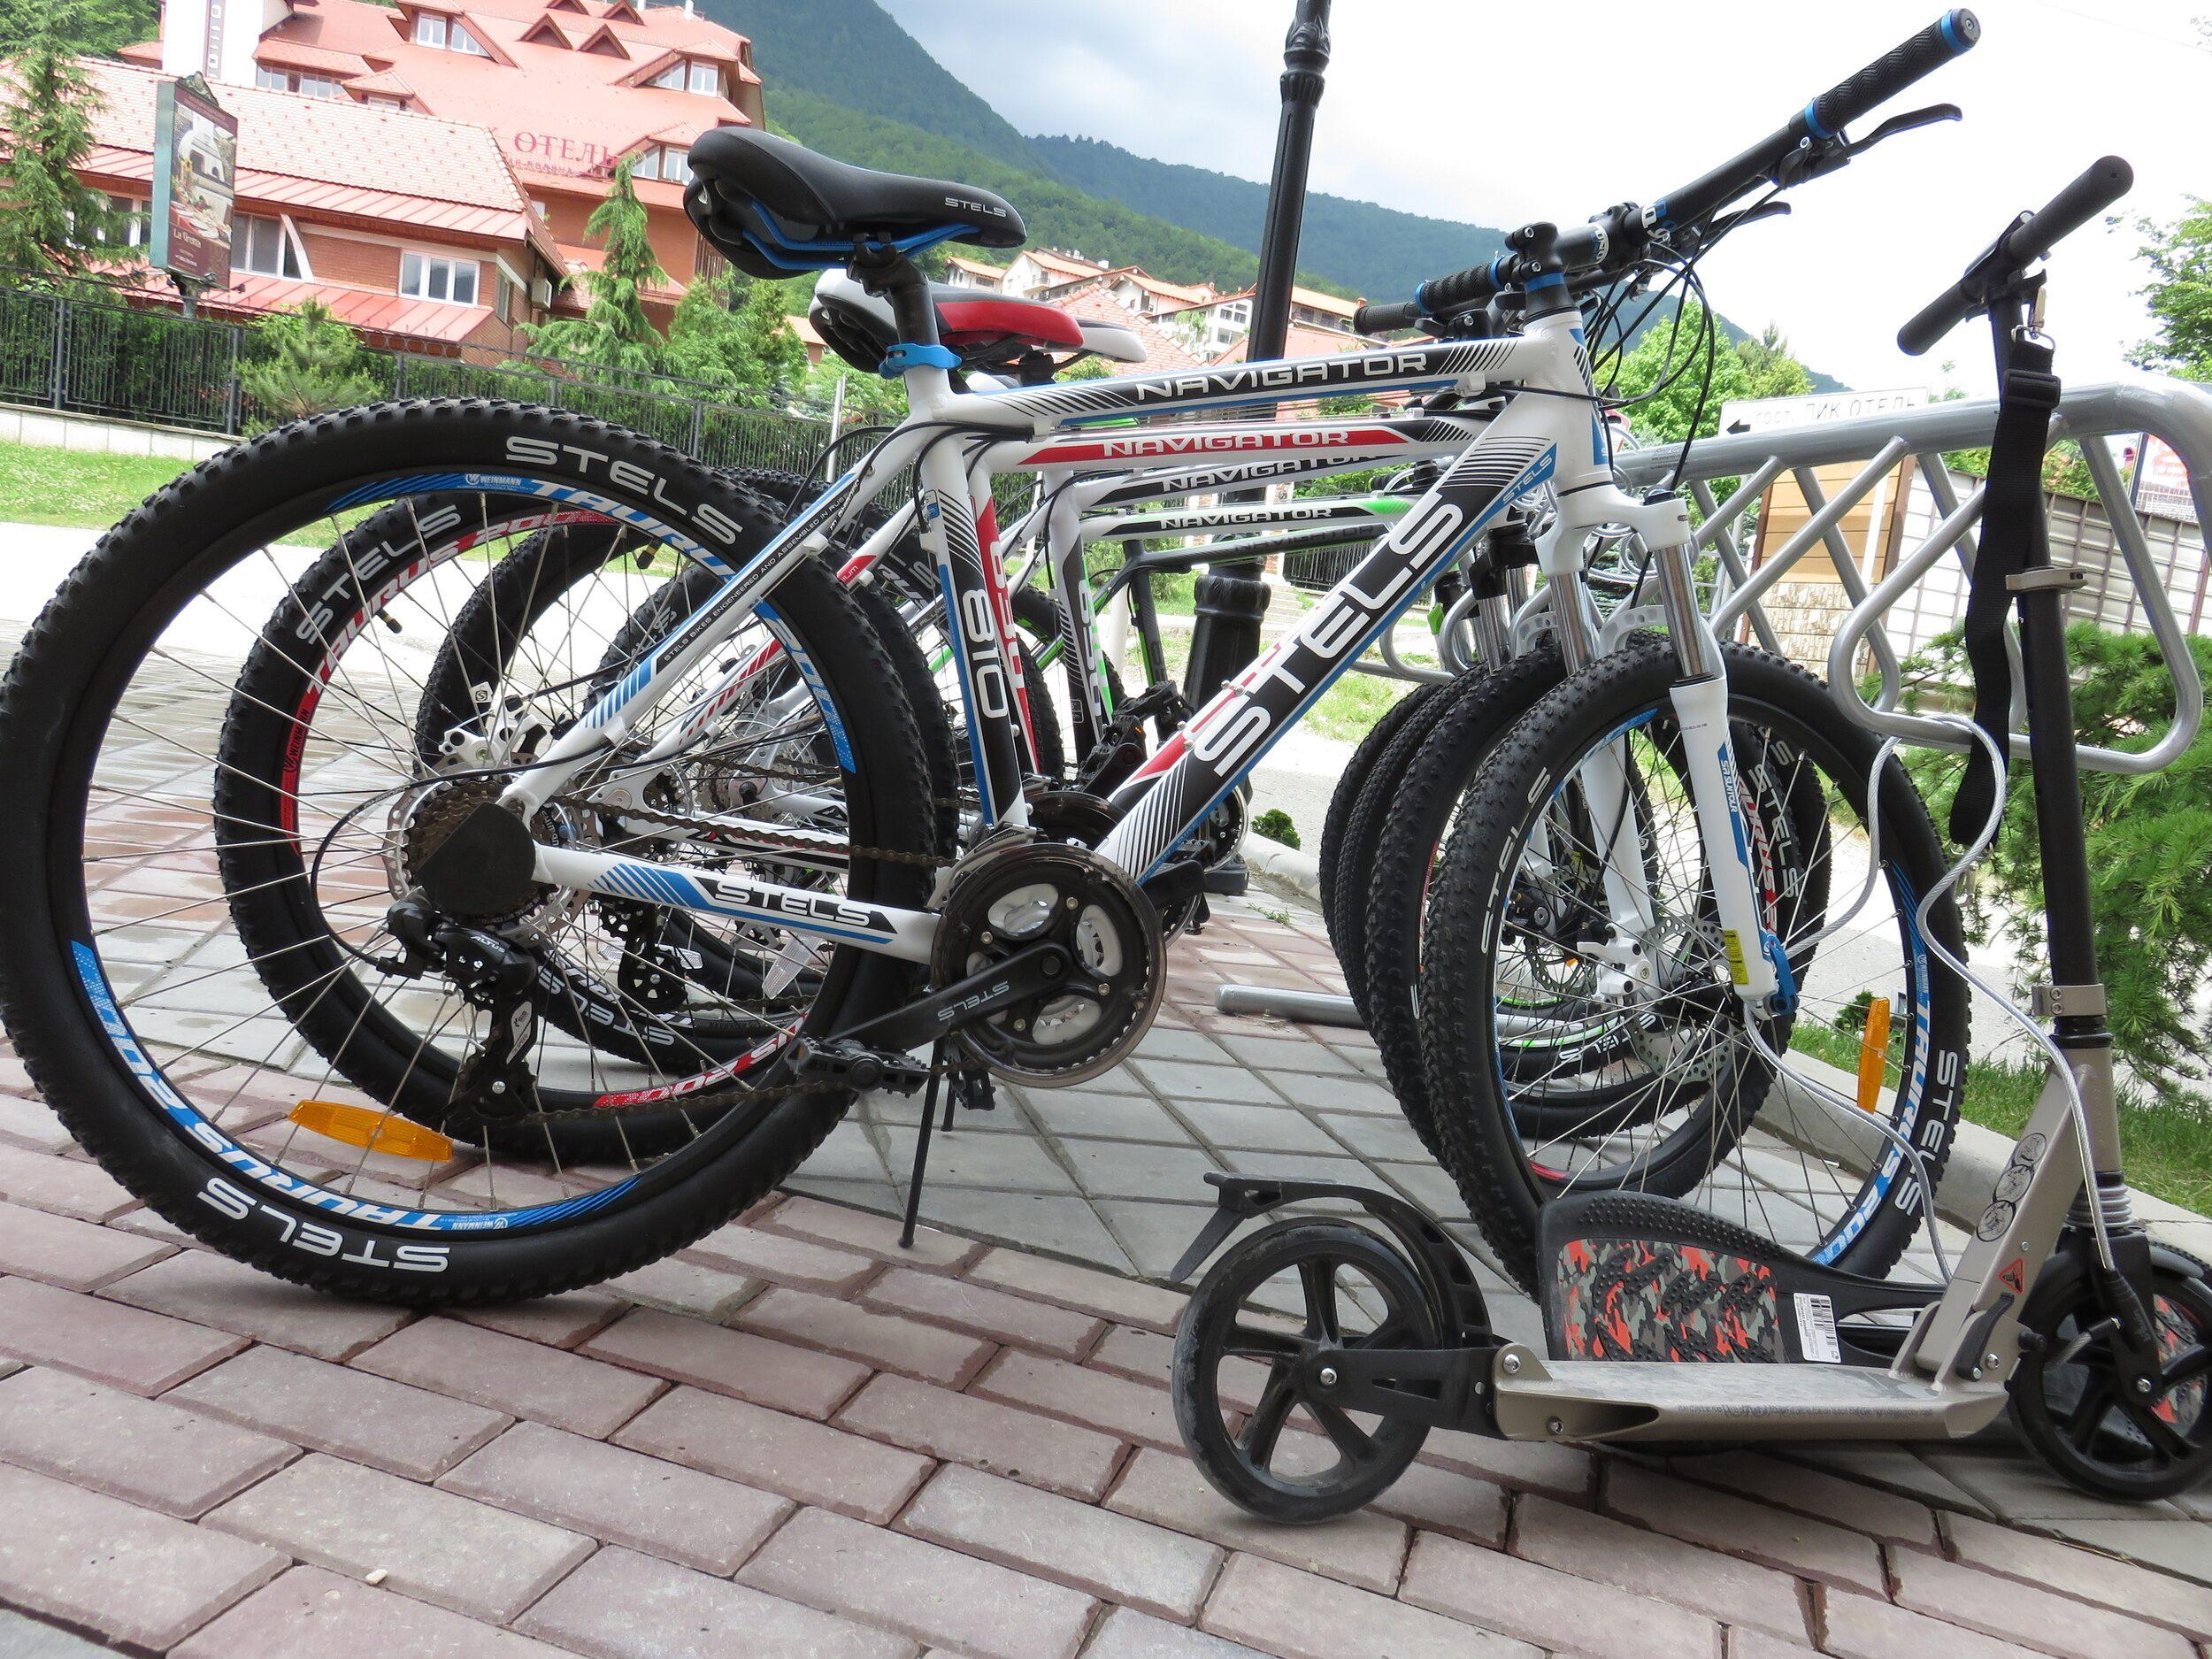 Прокат велосипедов - Экстрим в Казани Клуб XFREEDOM